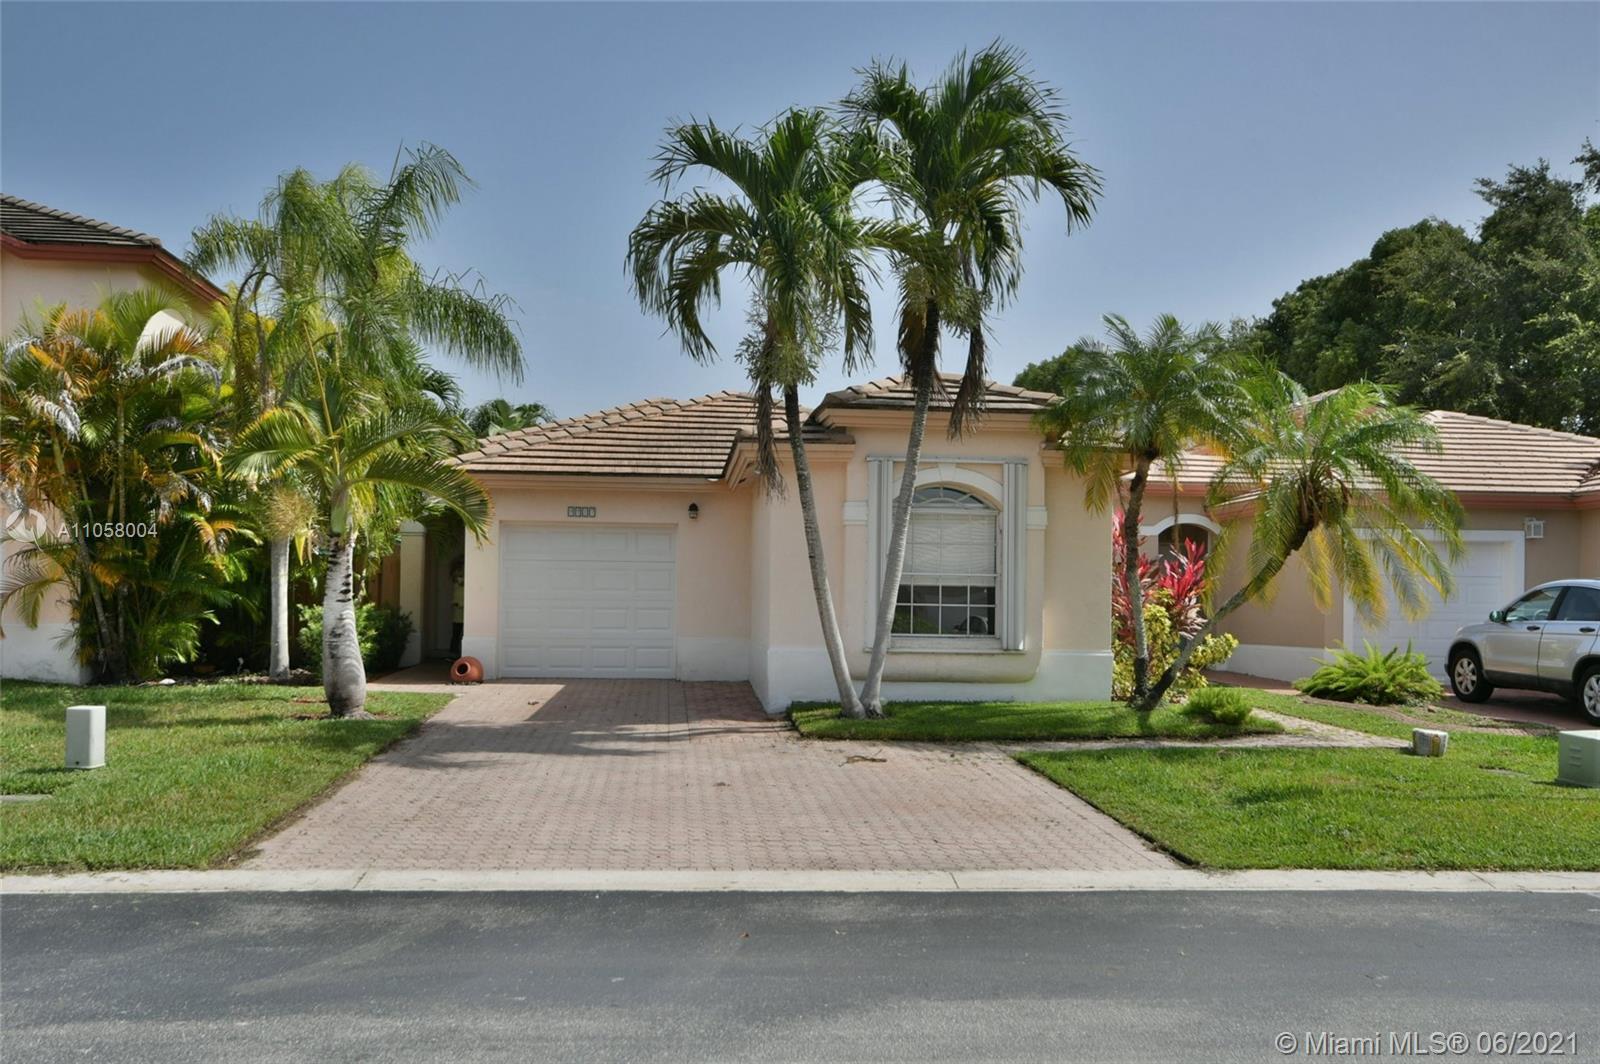 Costa Verde - 9917 NW 31st St, Doral, FL 33172